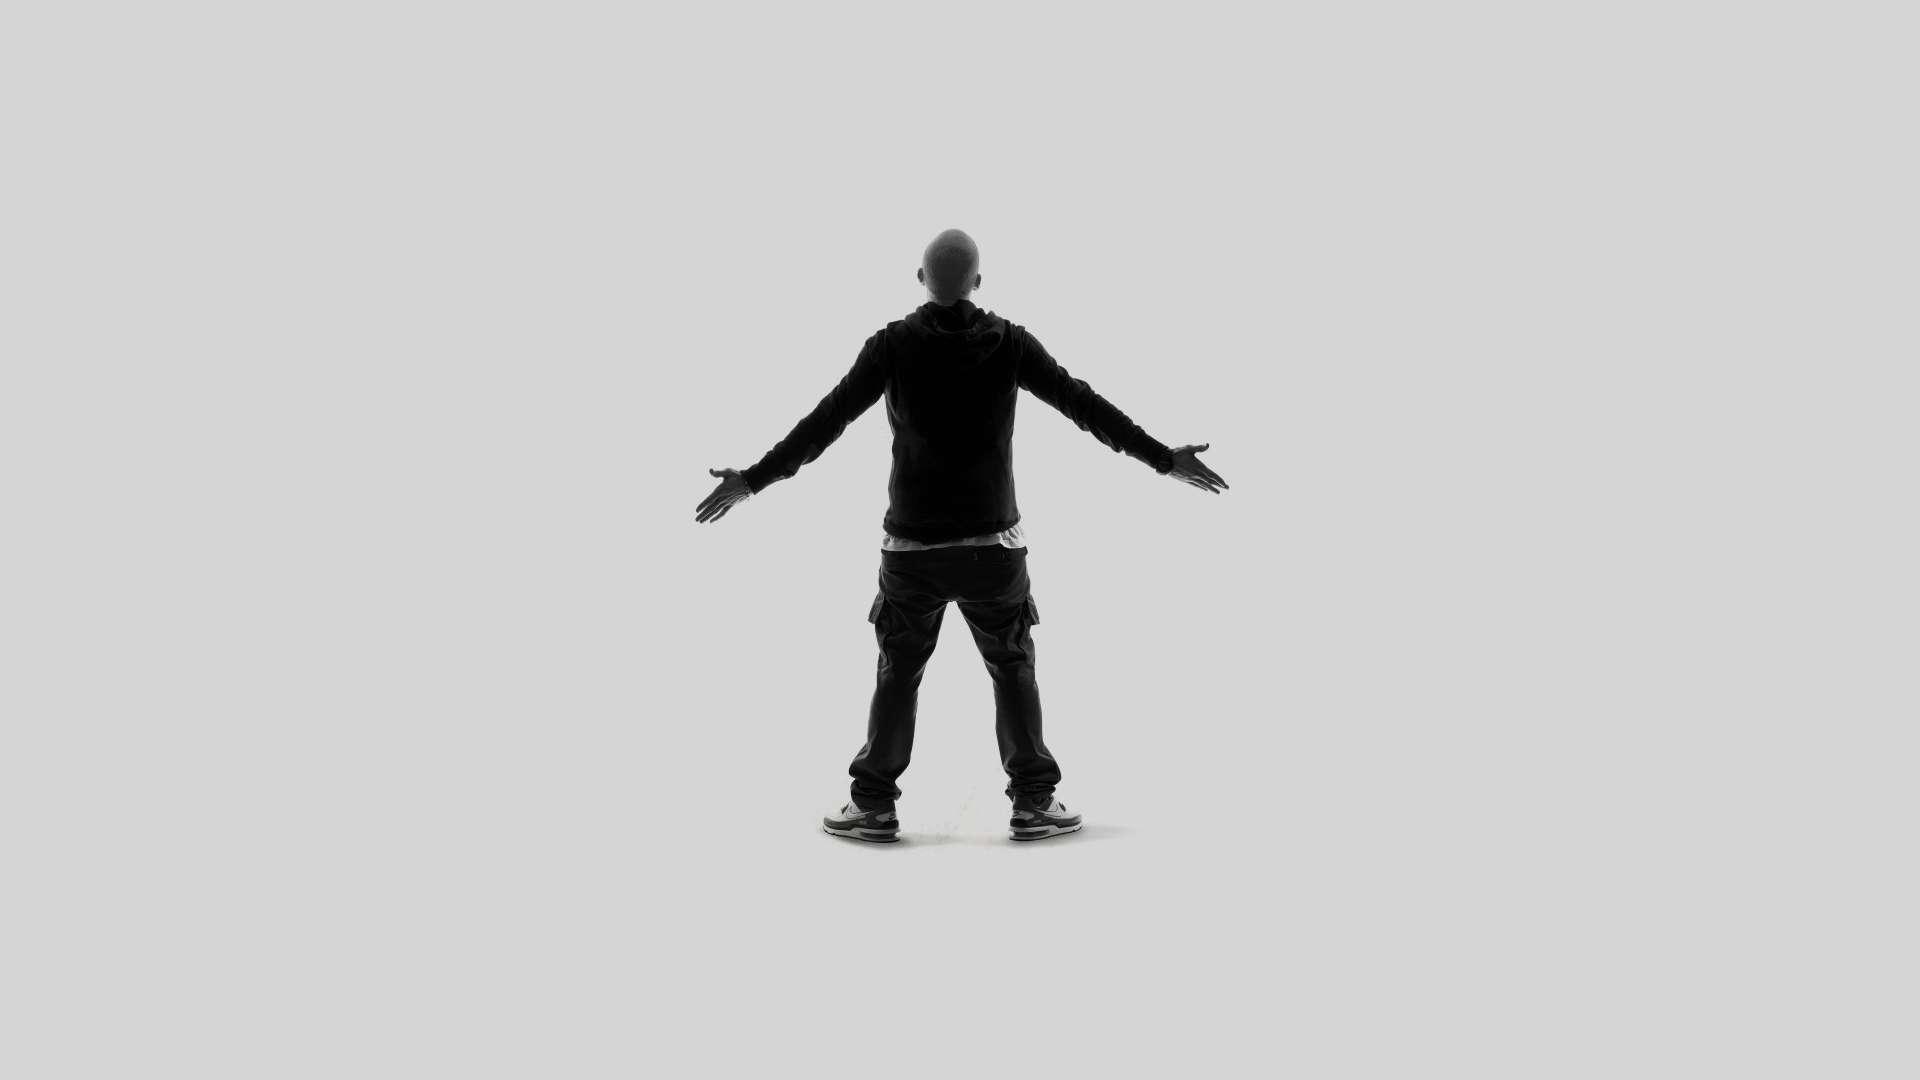 Hd wallpaper upload - Wallpaper 2013 Mmlp2 Eminem Rap God Hd Wallpaper 1080p Upload At